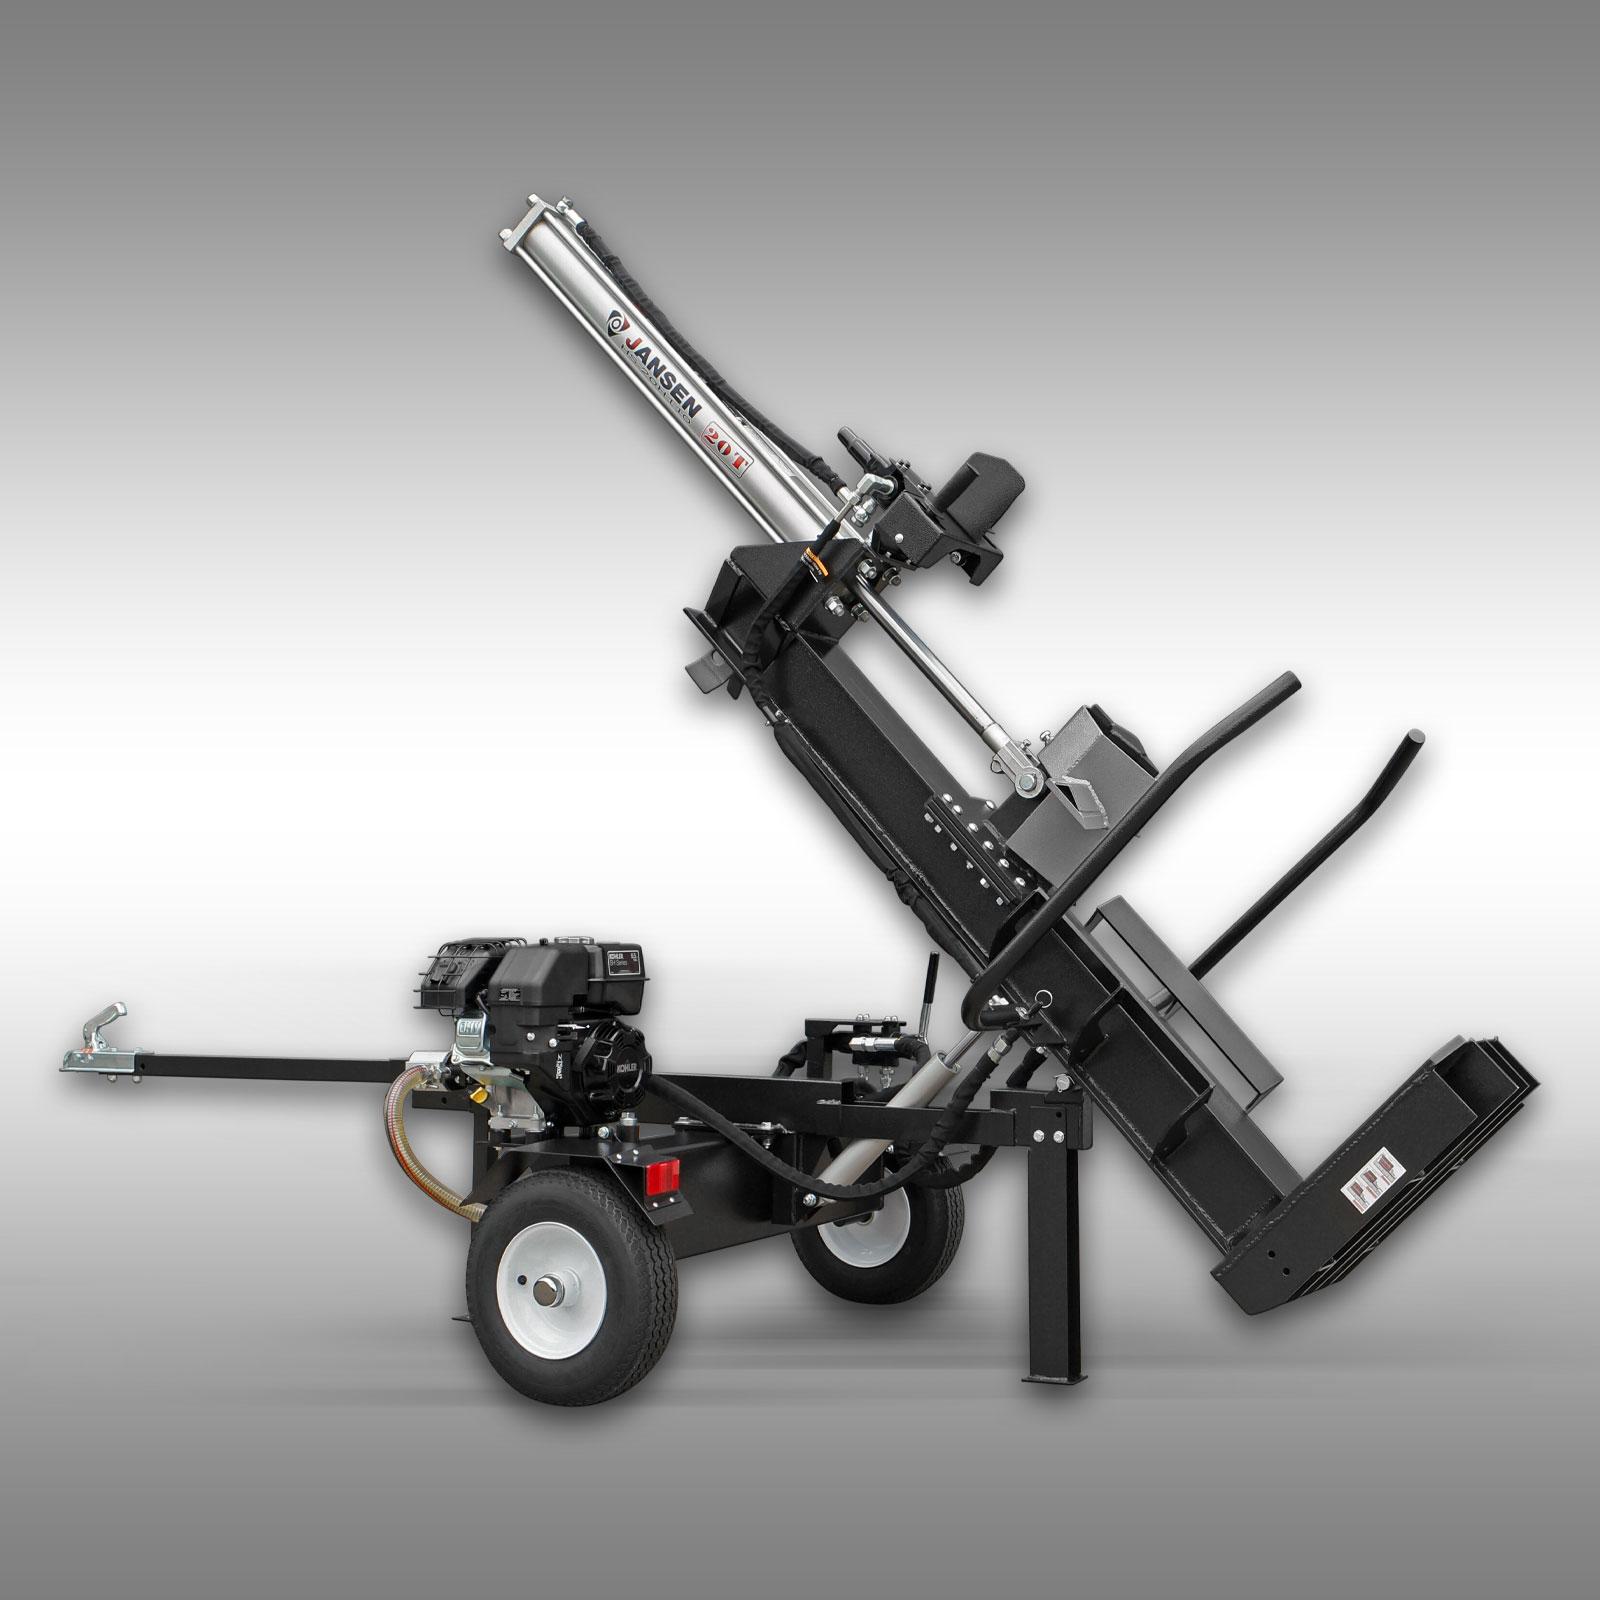 holzspalter jansen hs 20h110 20 t 110 cm benzin. Black Bedroom Furniture Sets. Home Design Ideas